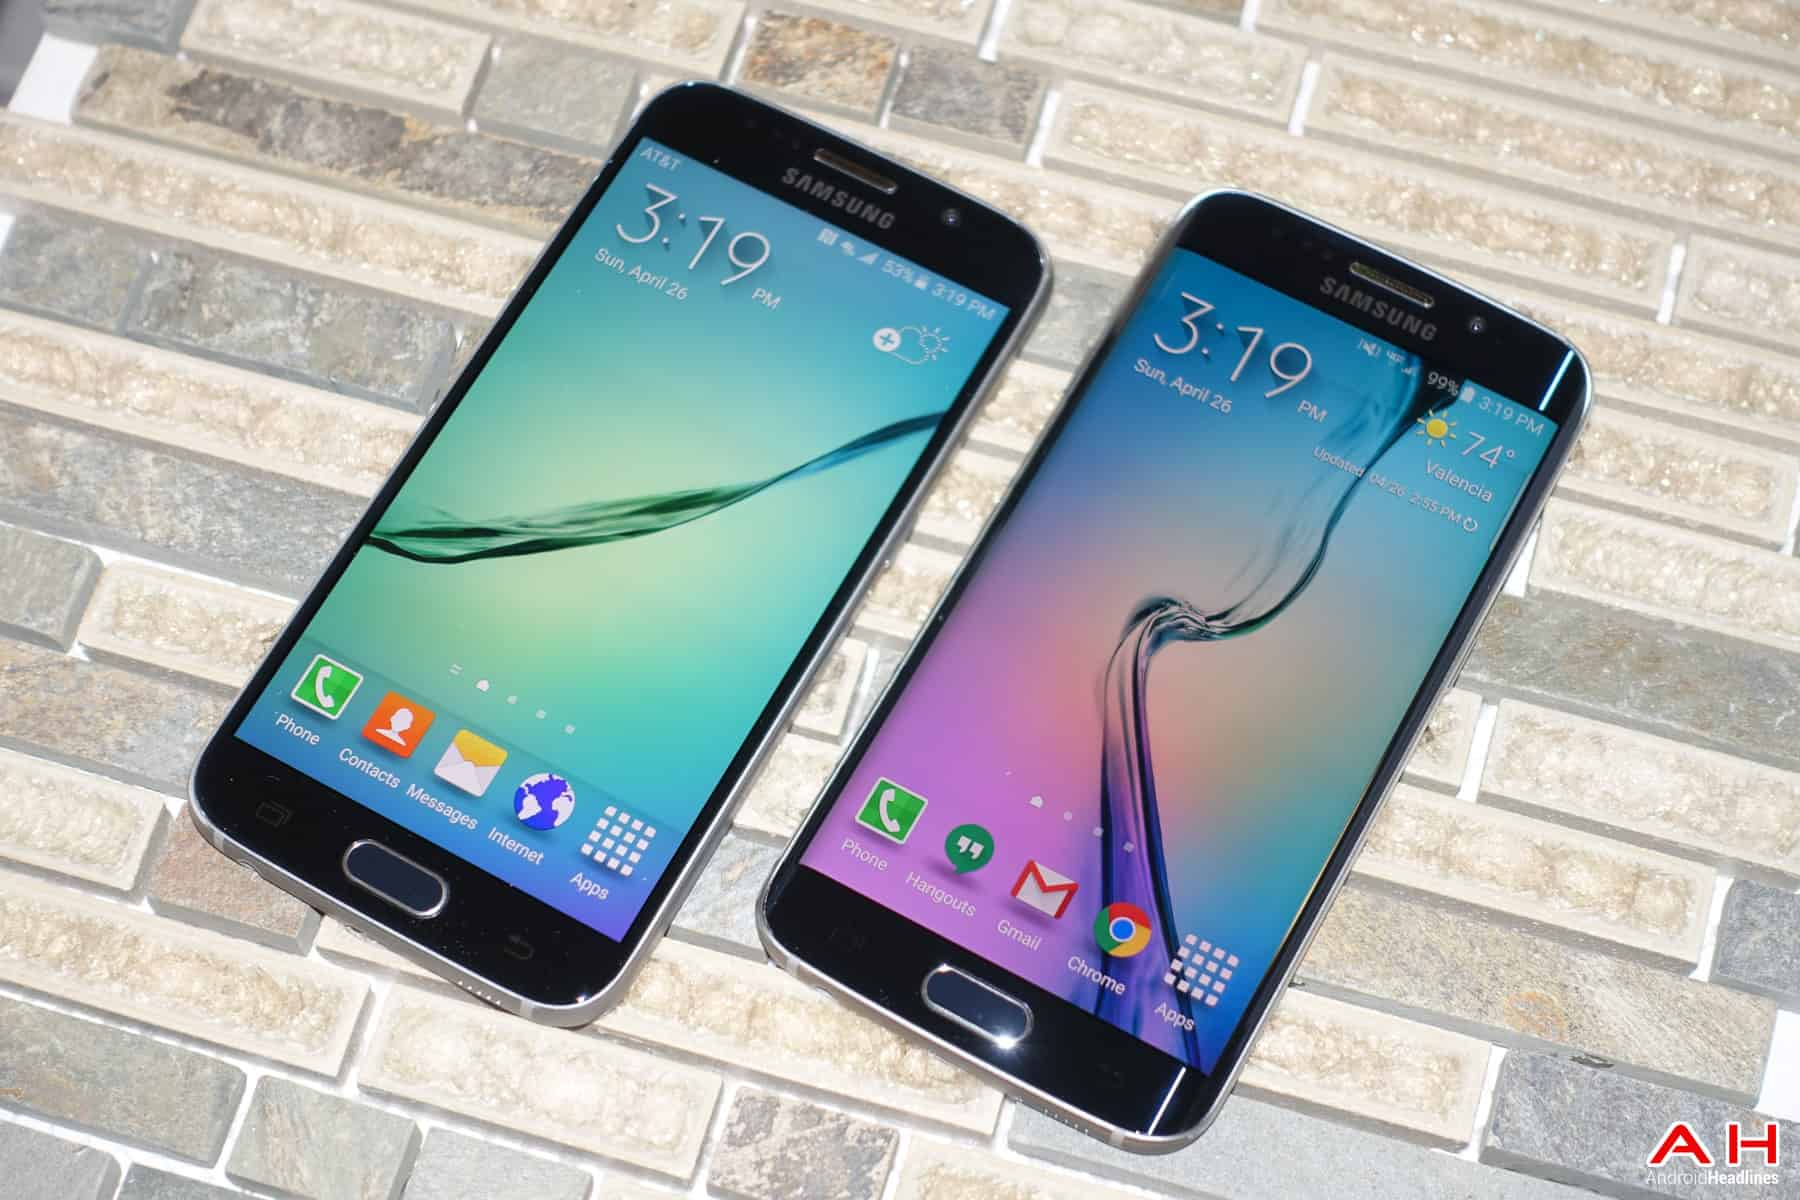 AH Samsung Galaxy S6 Edge May 3rd Chris 1